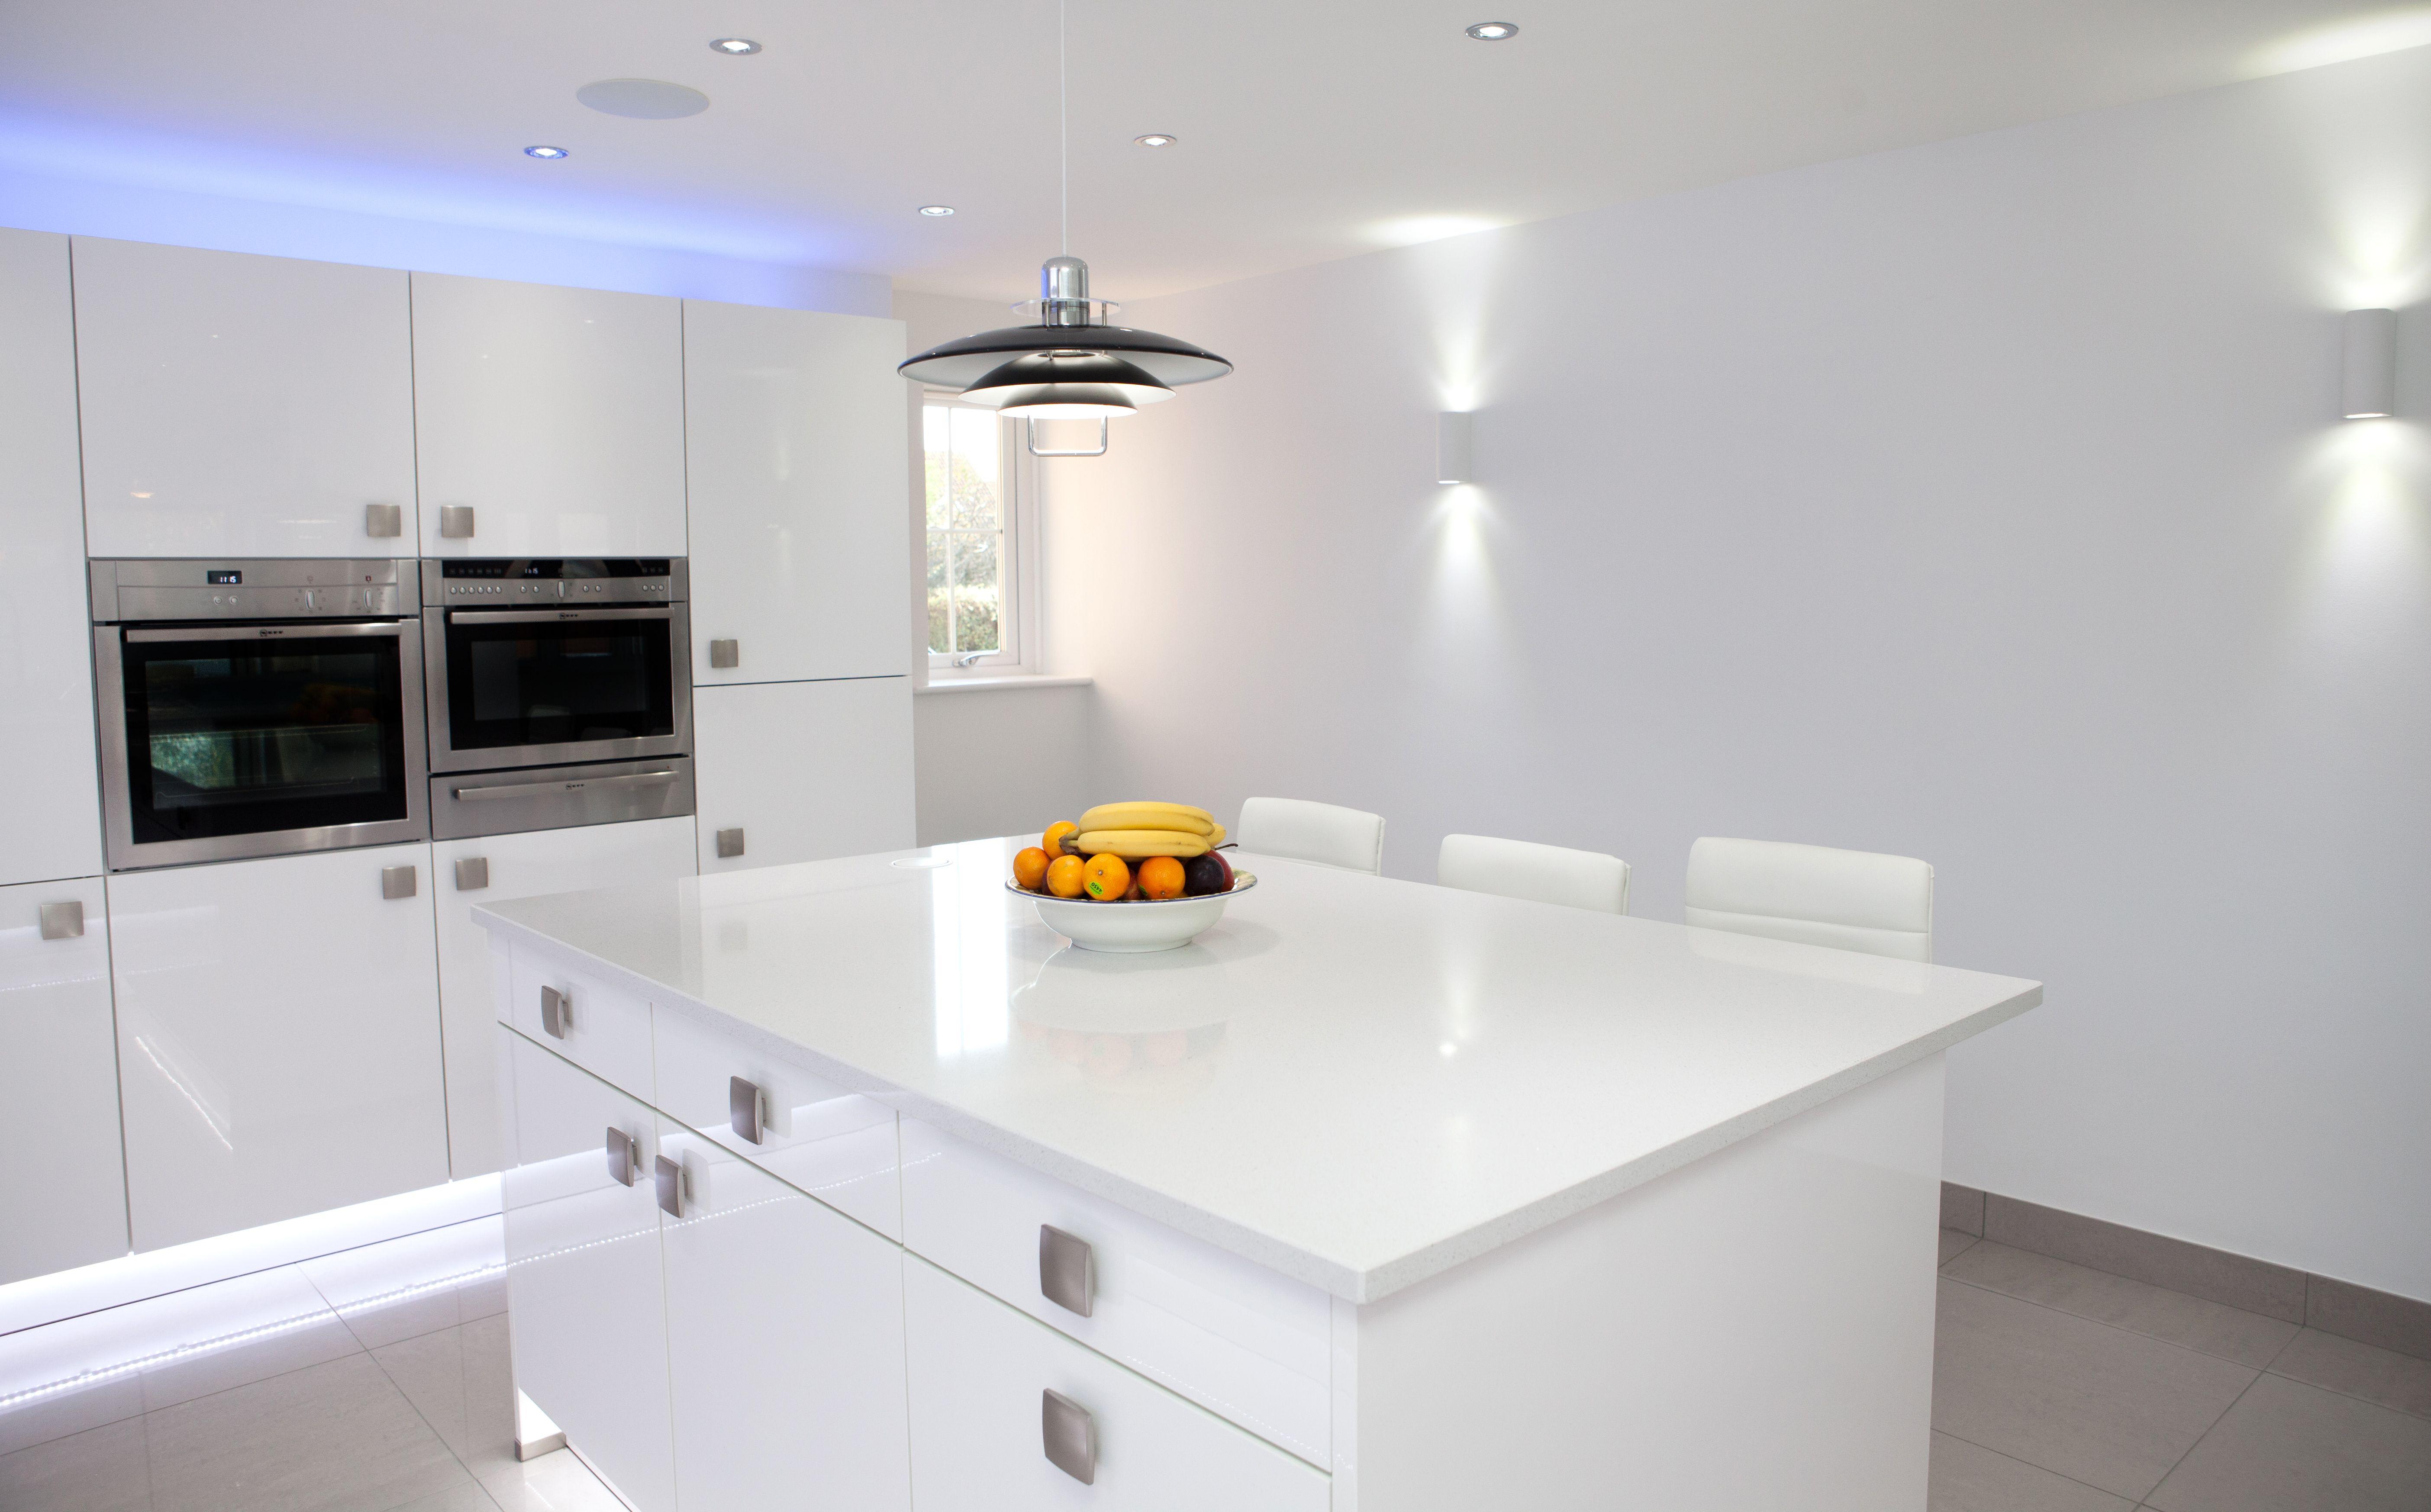 ashley ann ltd stirling kitchen neff microwave combination ashley ann ltd stirling kitchen neff microwave combination oven c57m70n3gb neff slide hide oven b45e52n3gb neff warming drawer n21h40